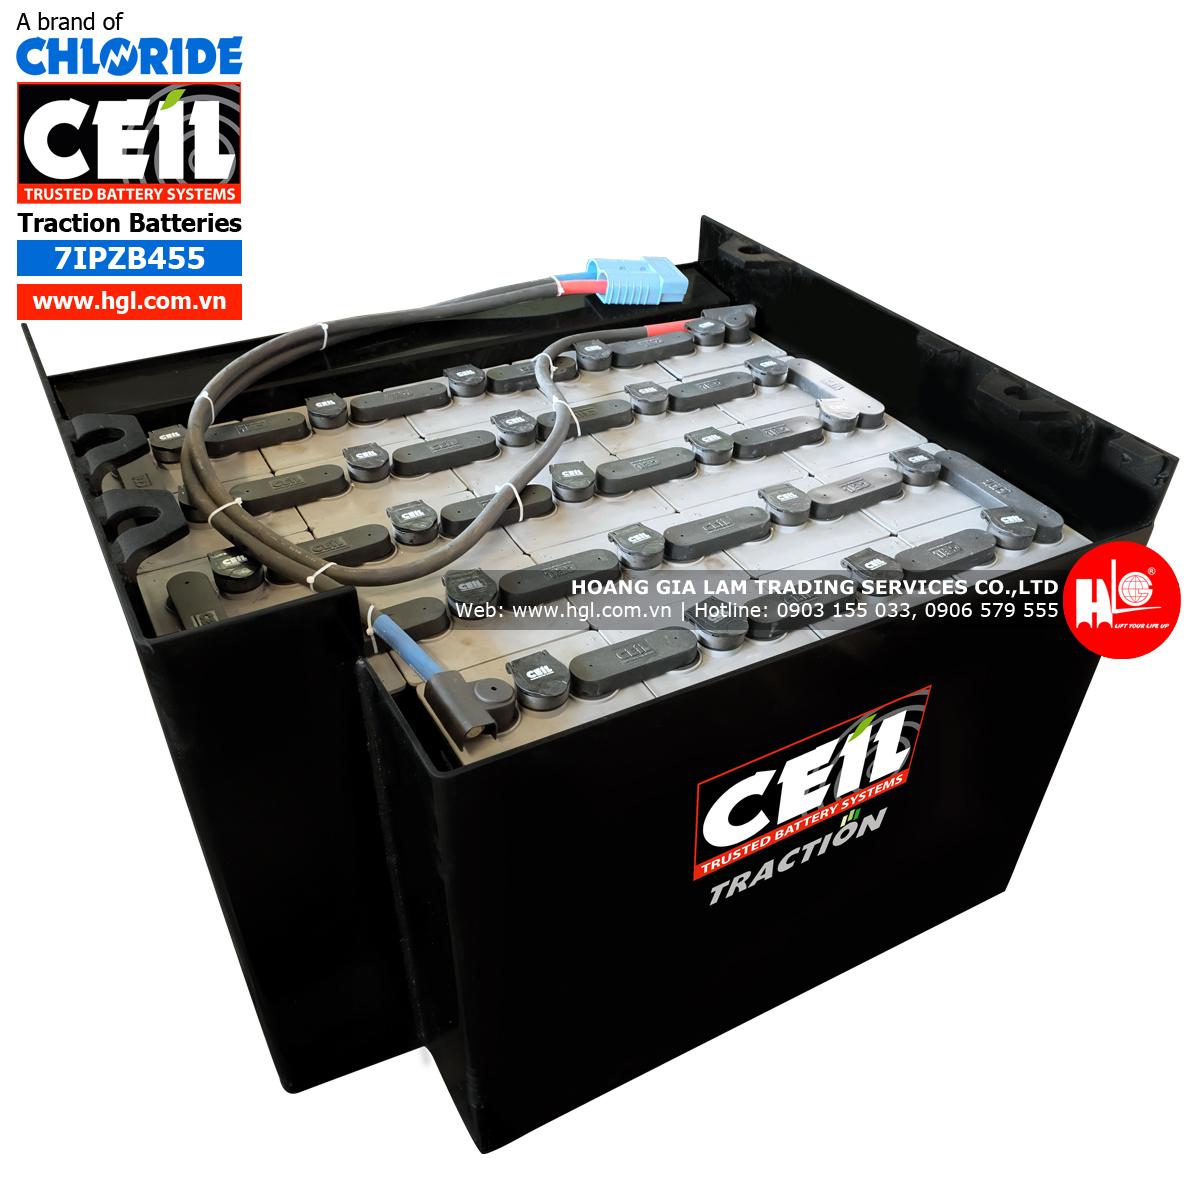 binh-dien-xe-nang-chloride-ceil-455ah-7IPZB455